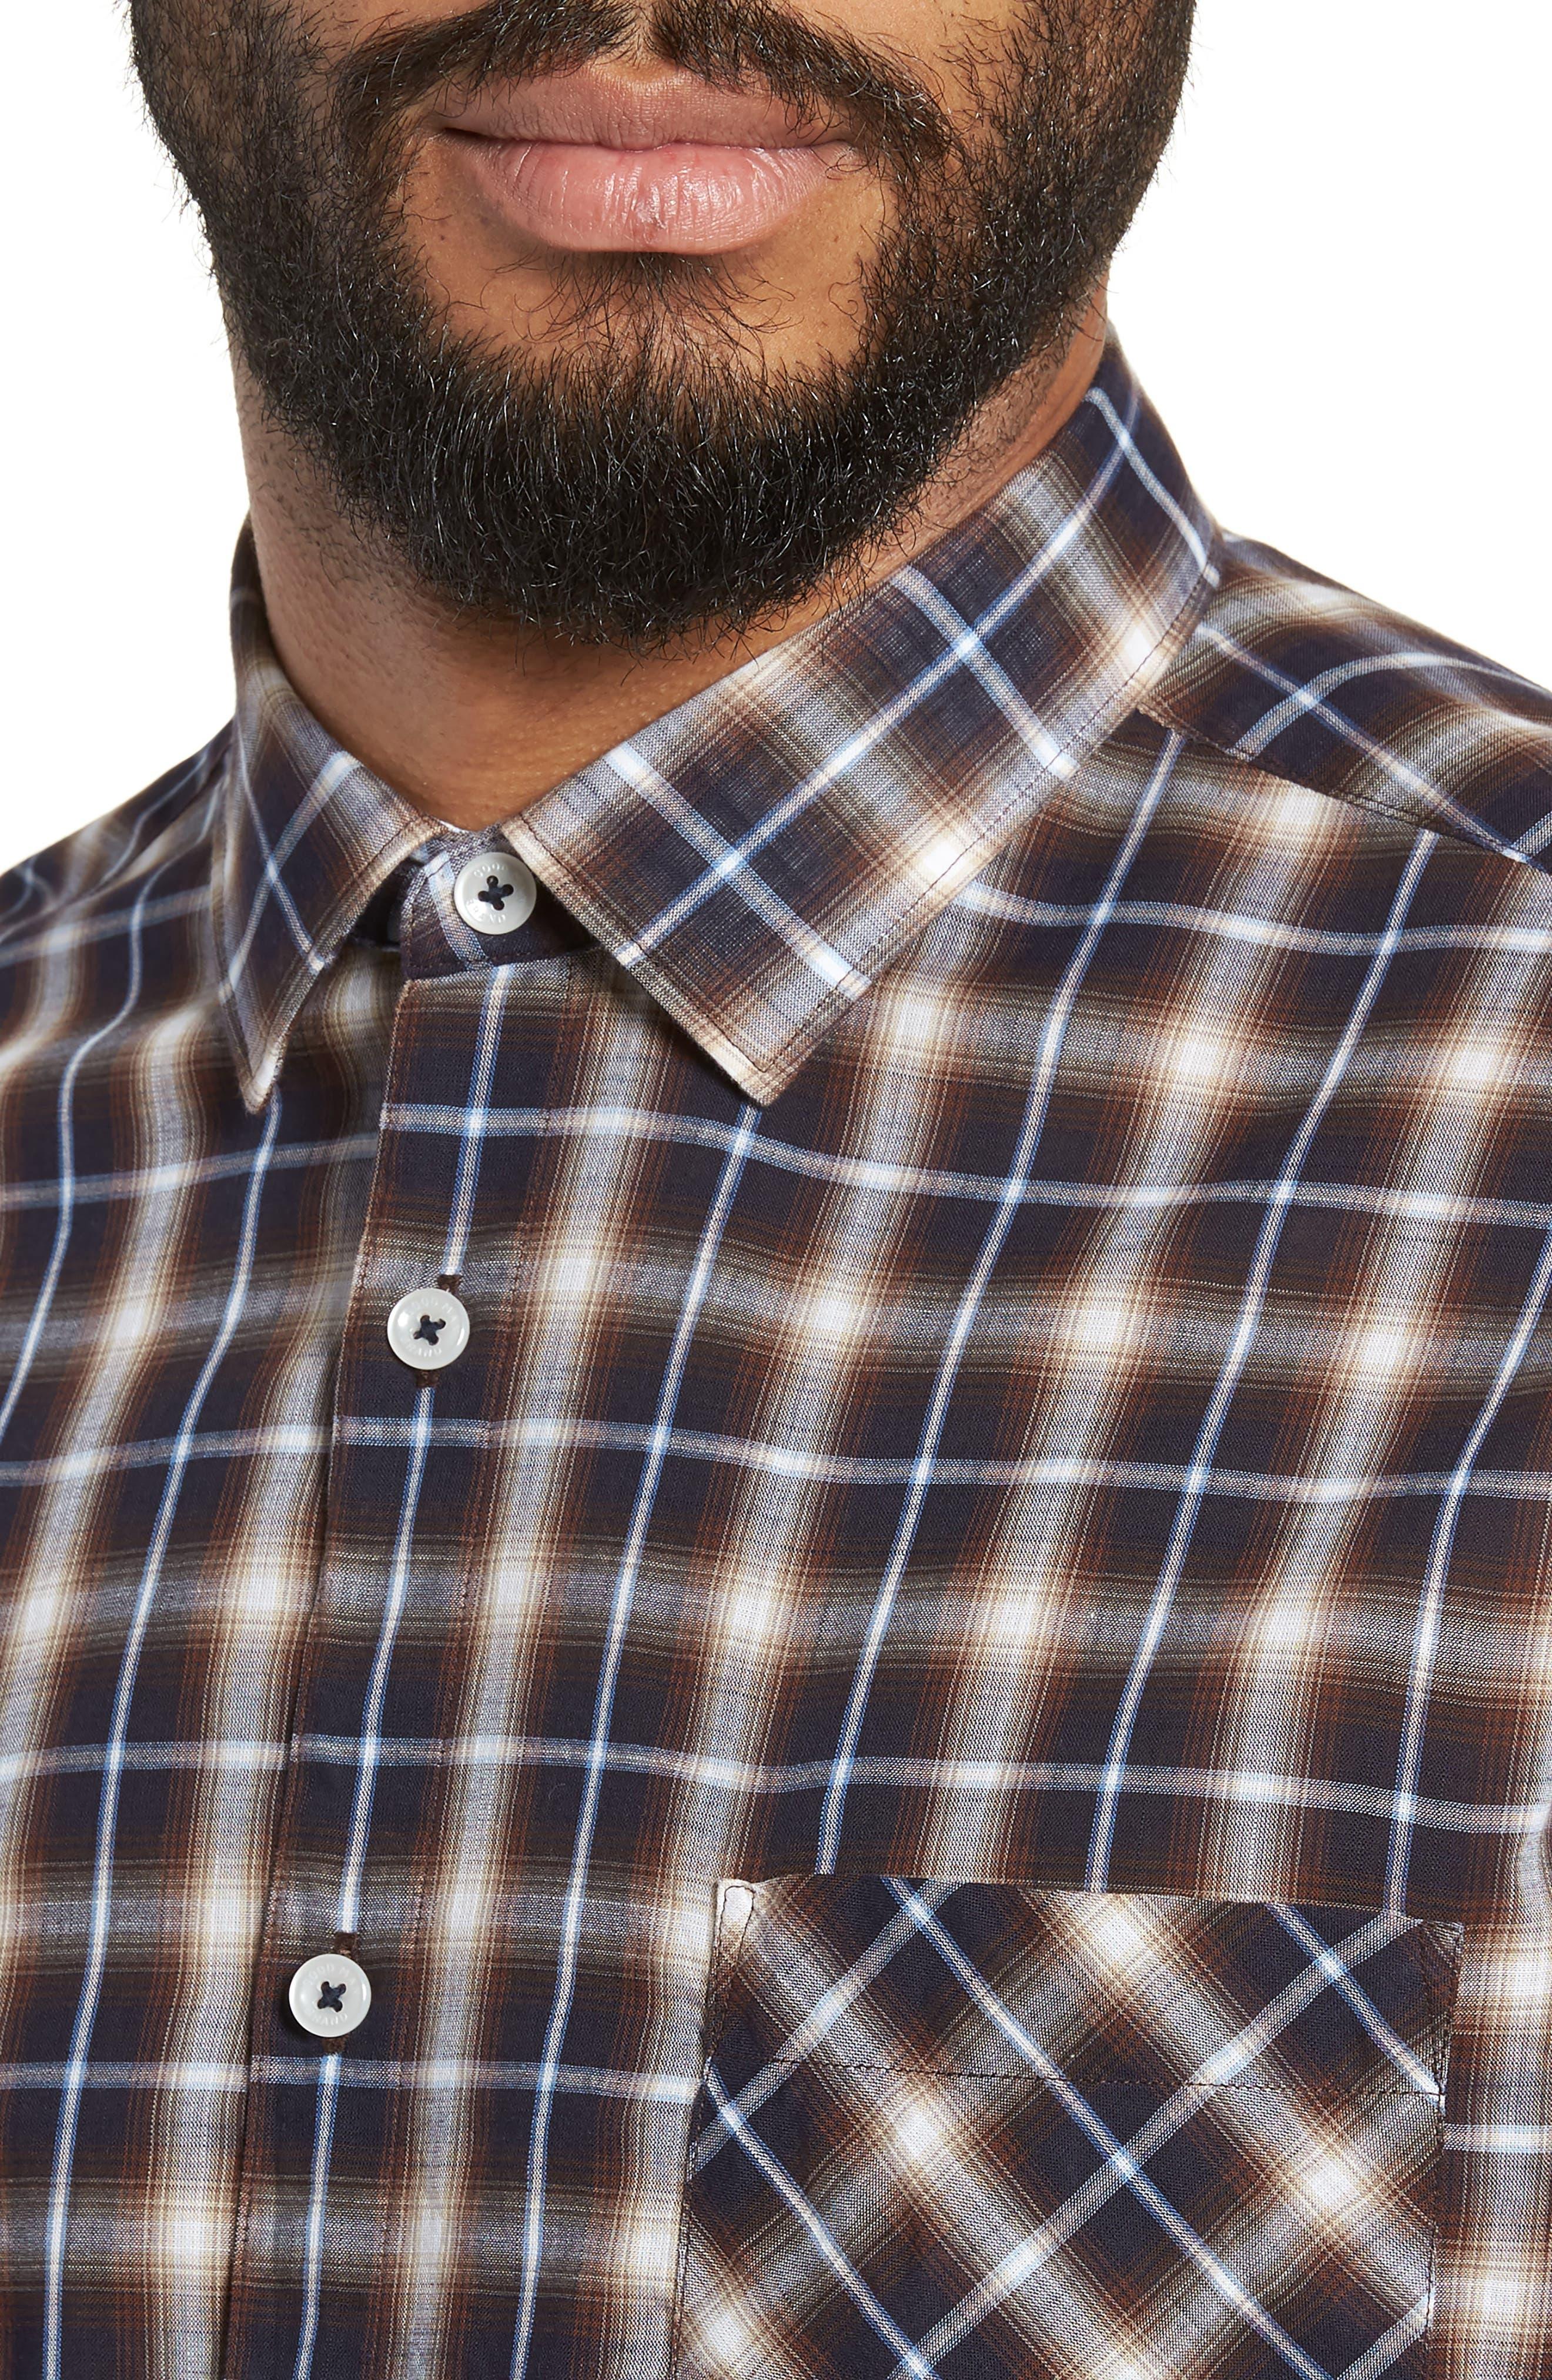 Alderplaid Slim Fit Sport Shirt,                             Alternate thumbnail 4, color,                             TOBACCO